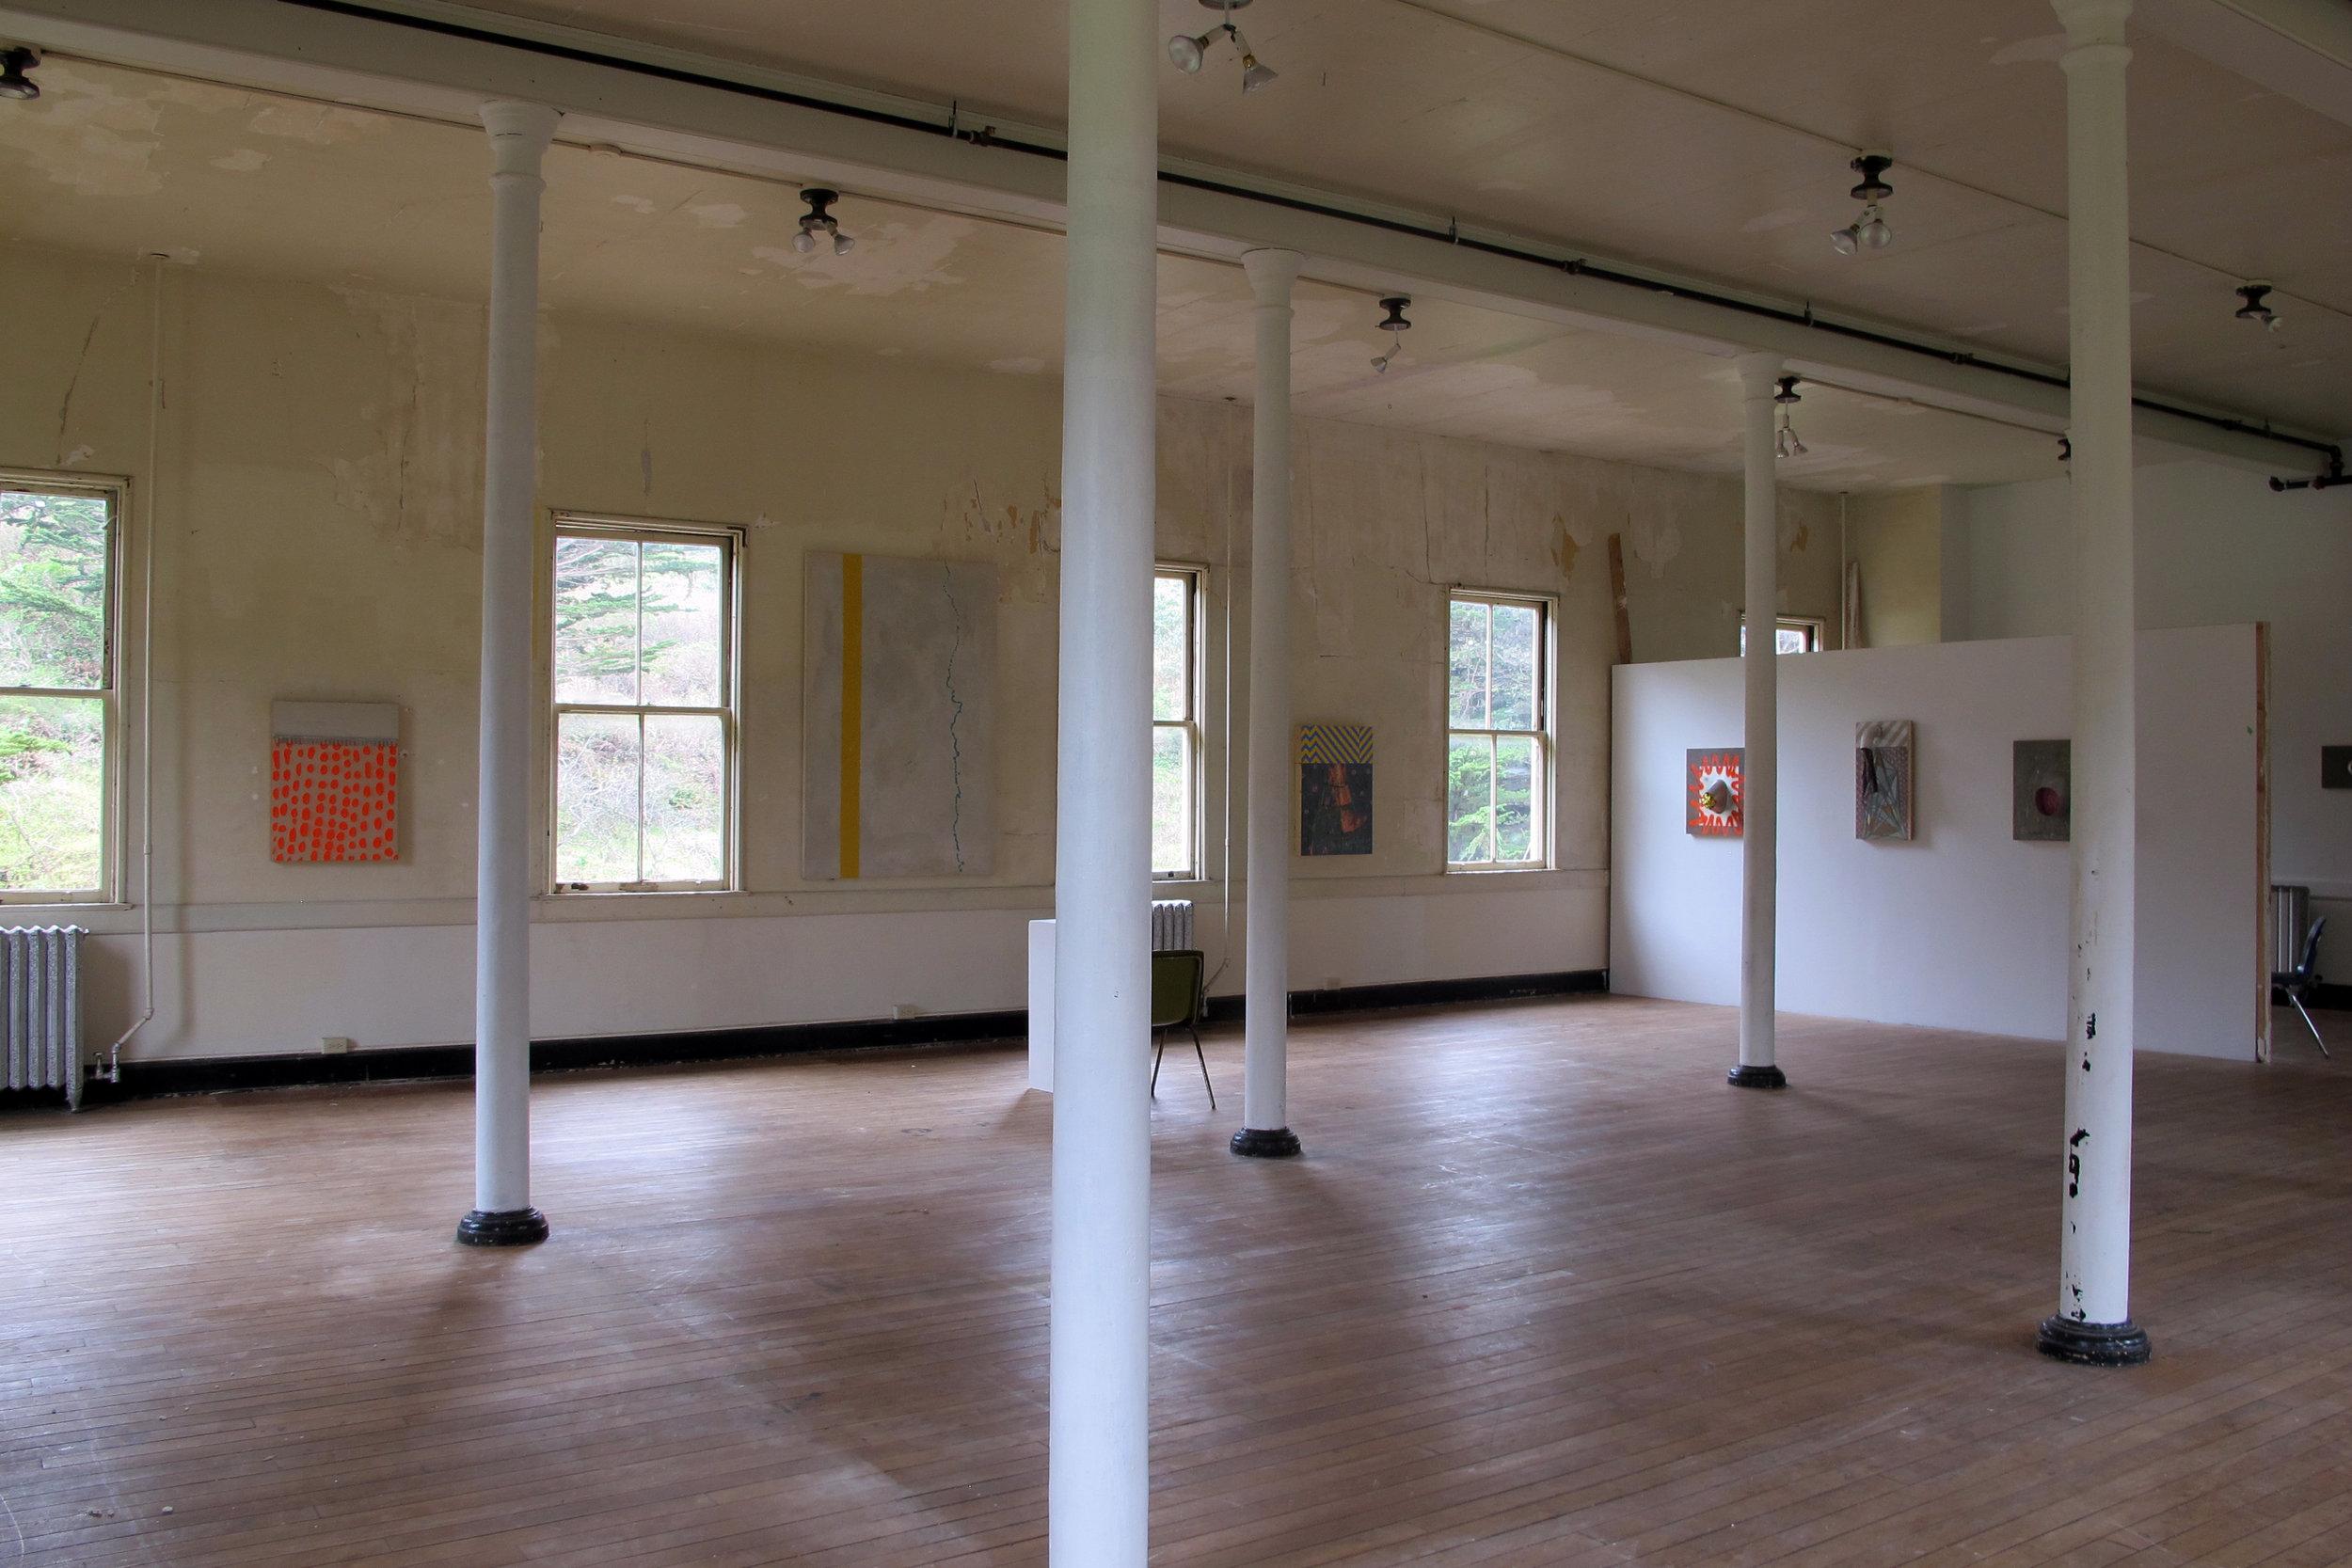 instalation @ Headlands center for the Arts